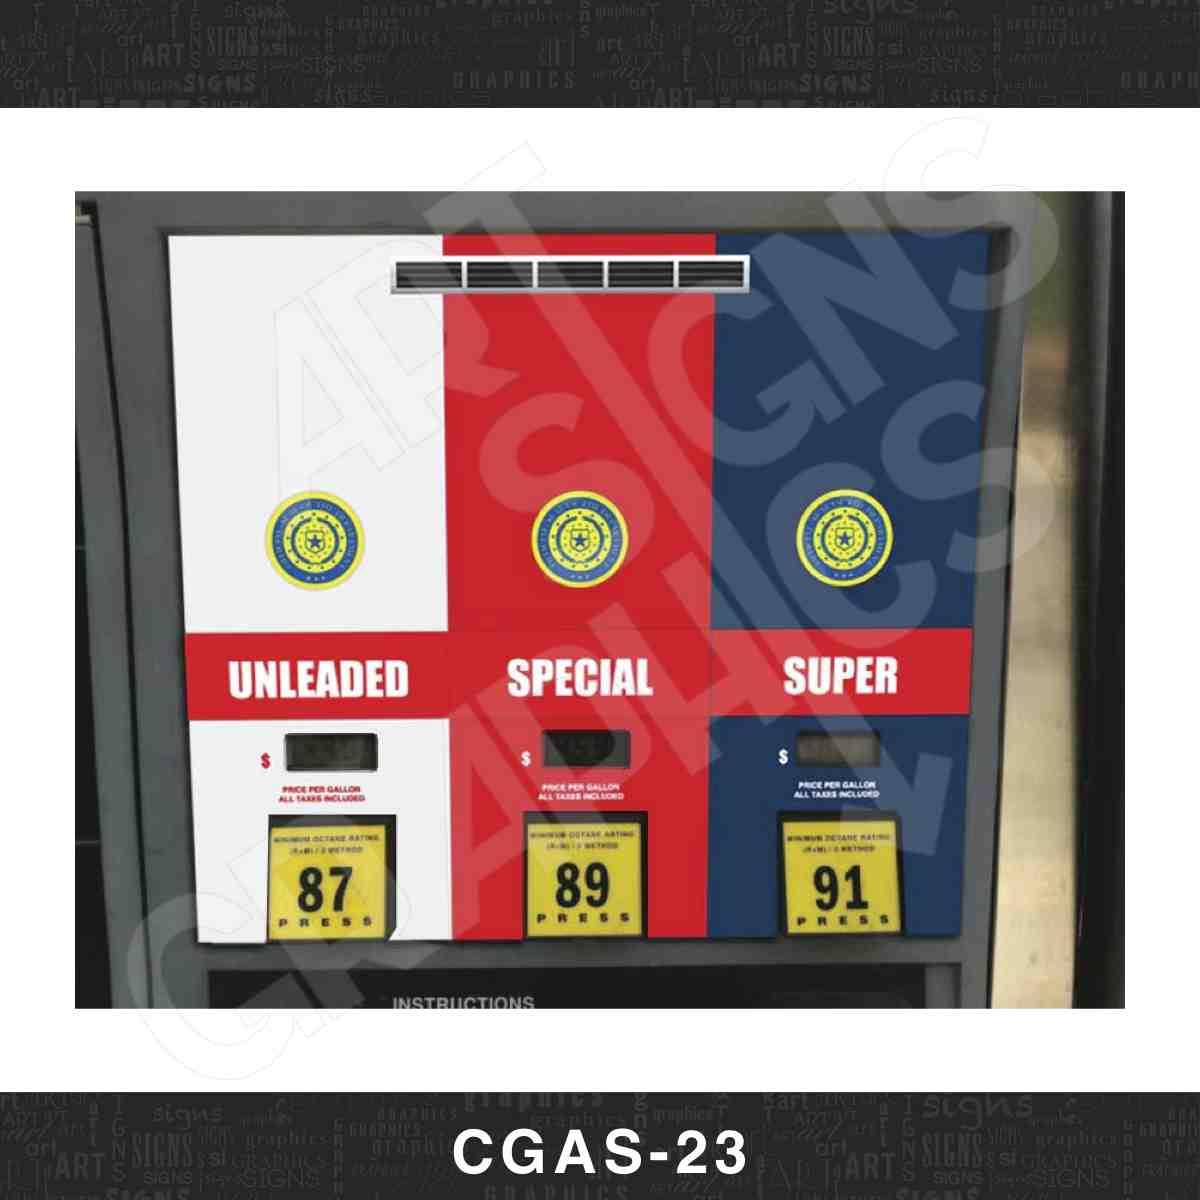 CGAS_23.jpg